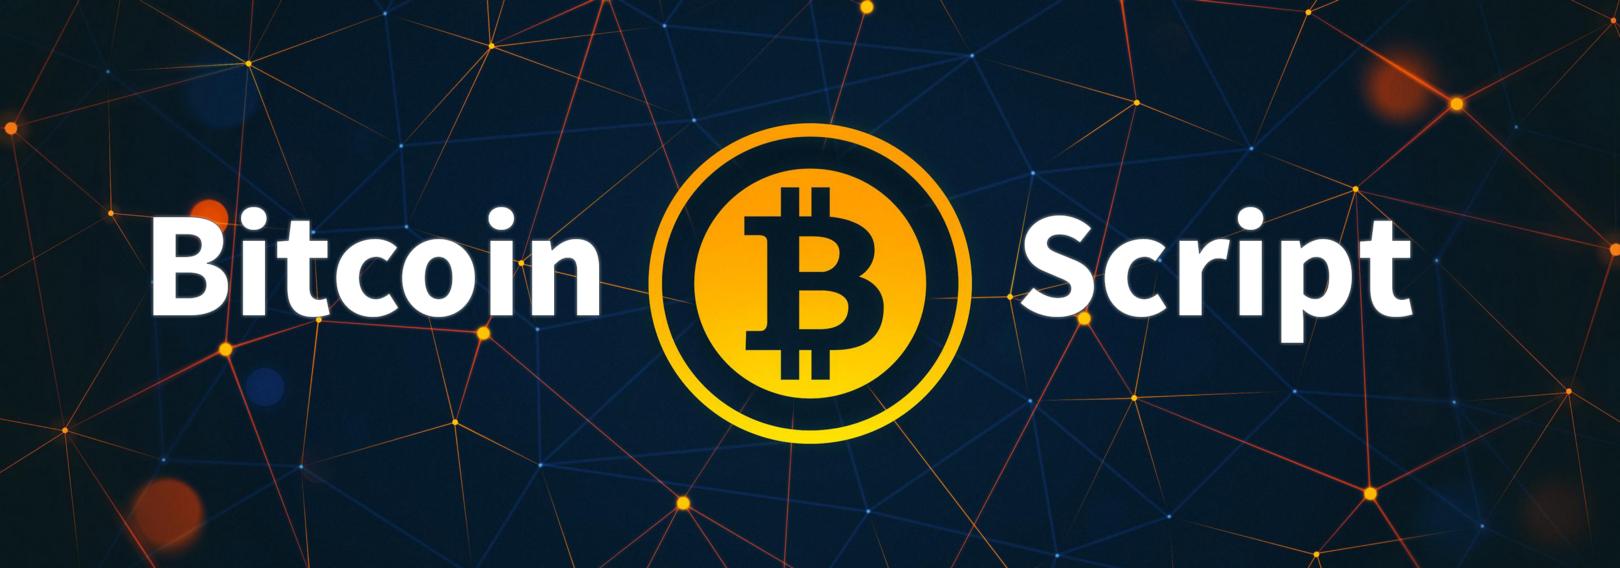 script bitcoin)